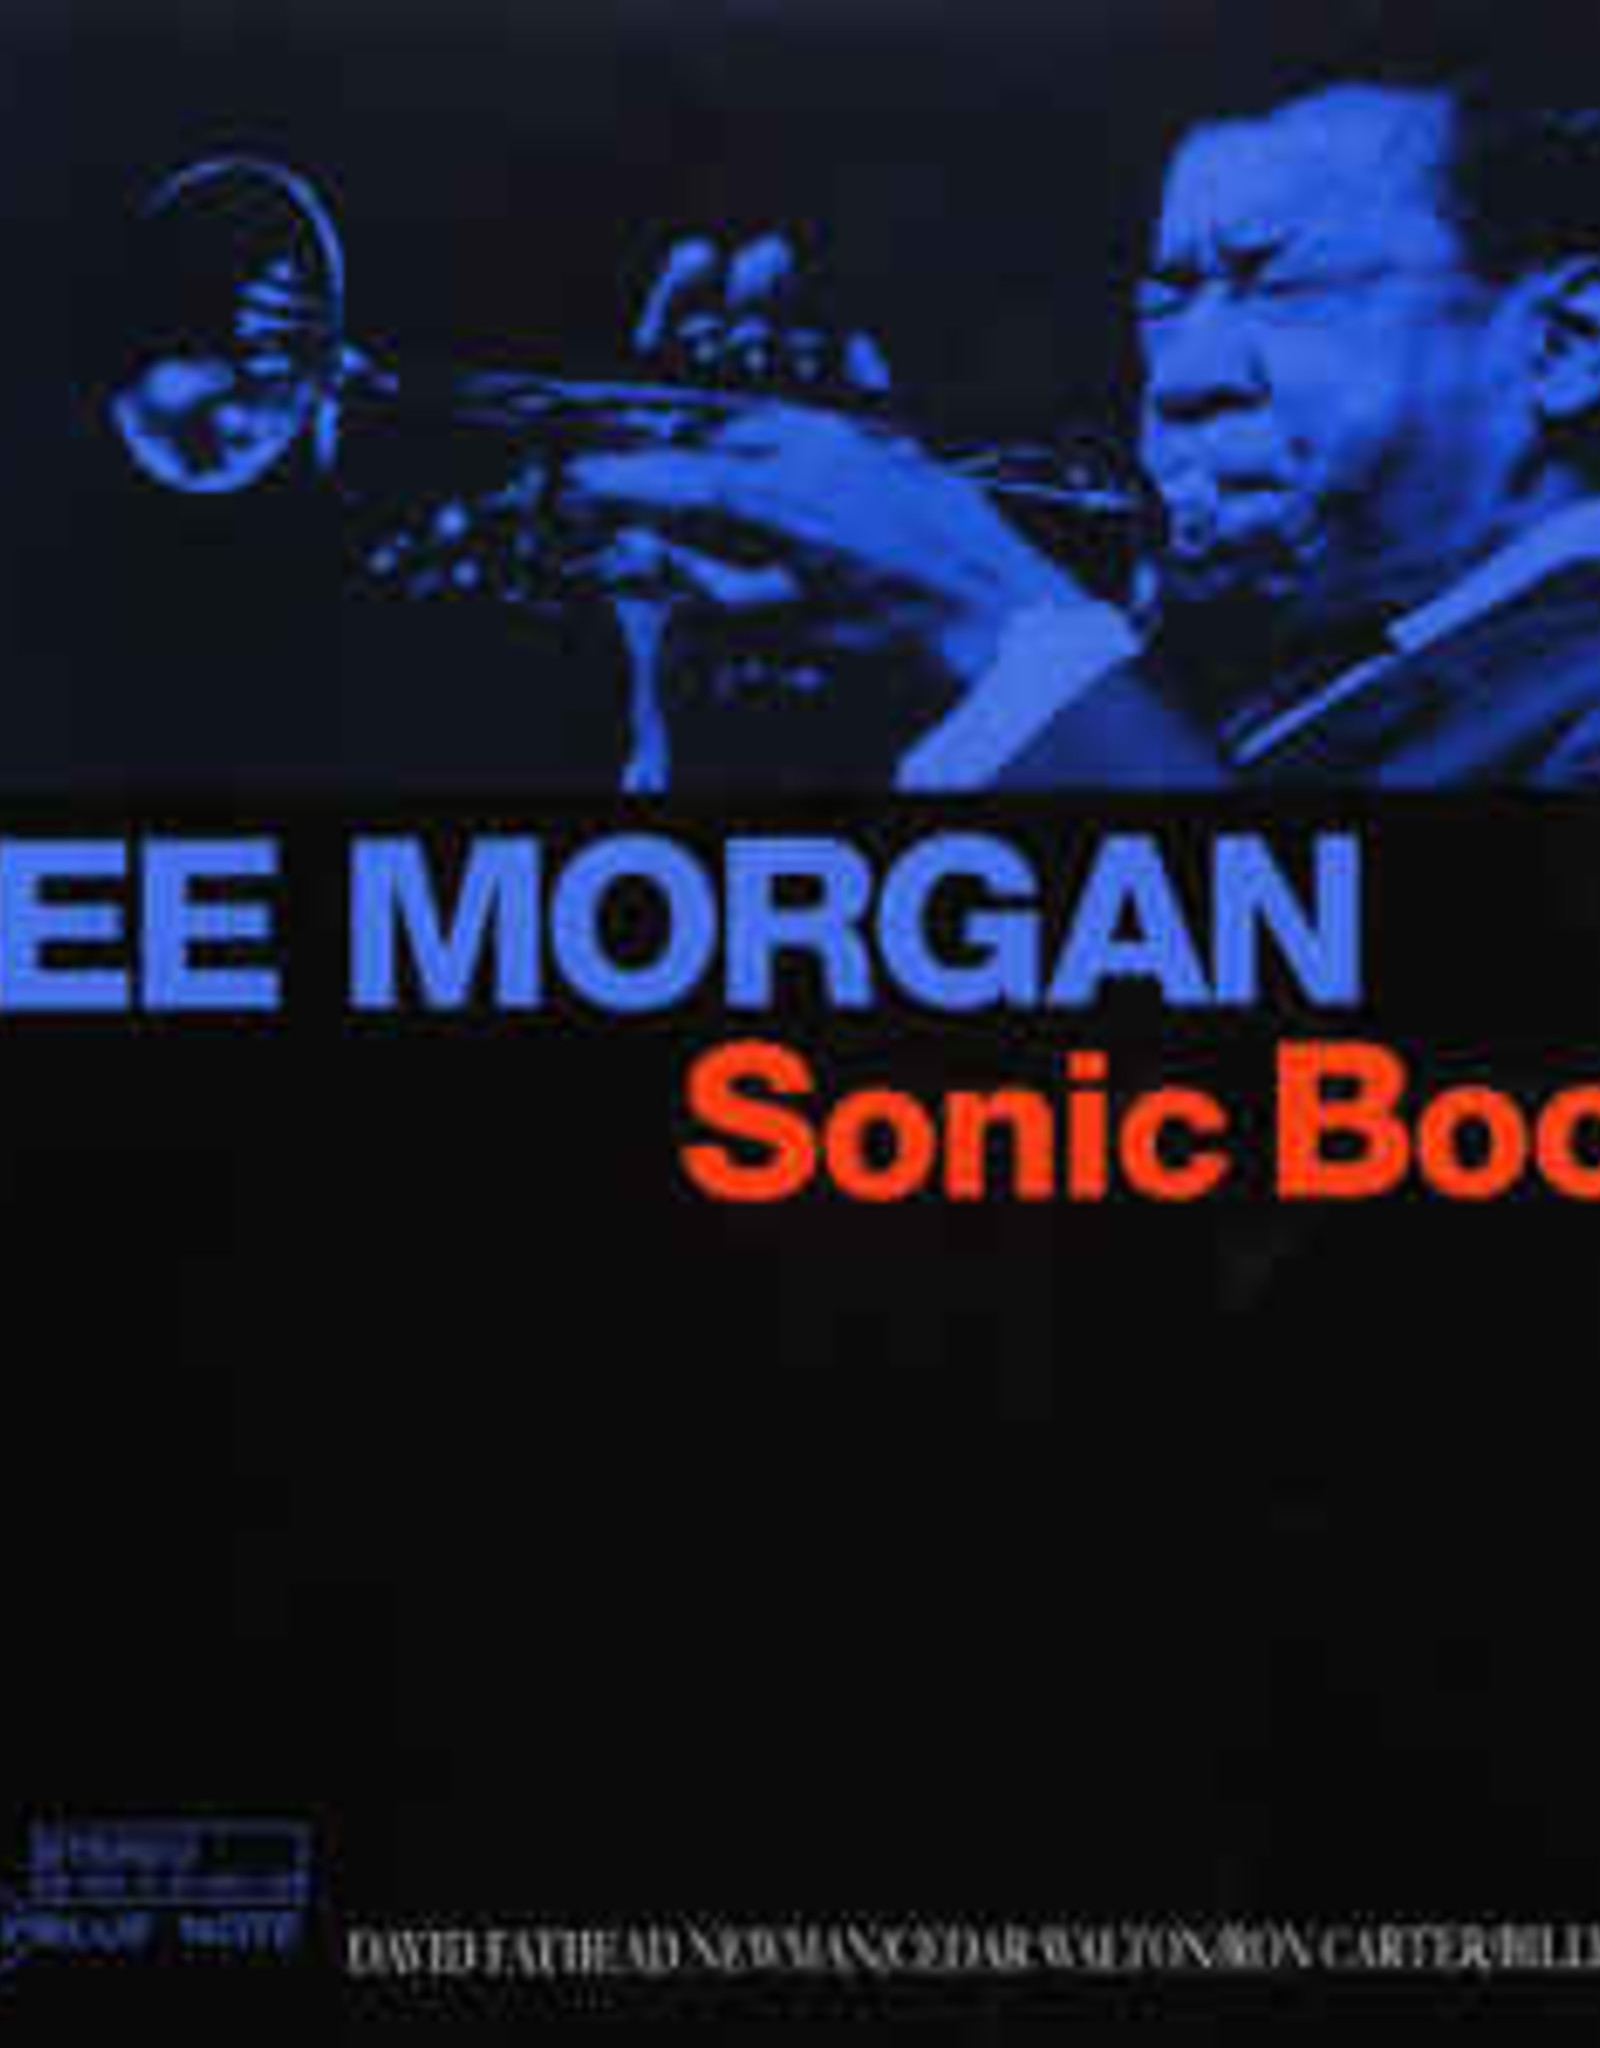 Lee Morgan - Sonic Boom